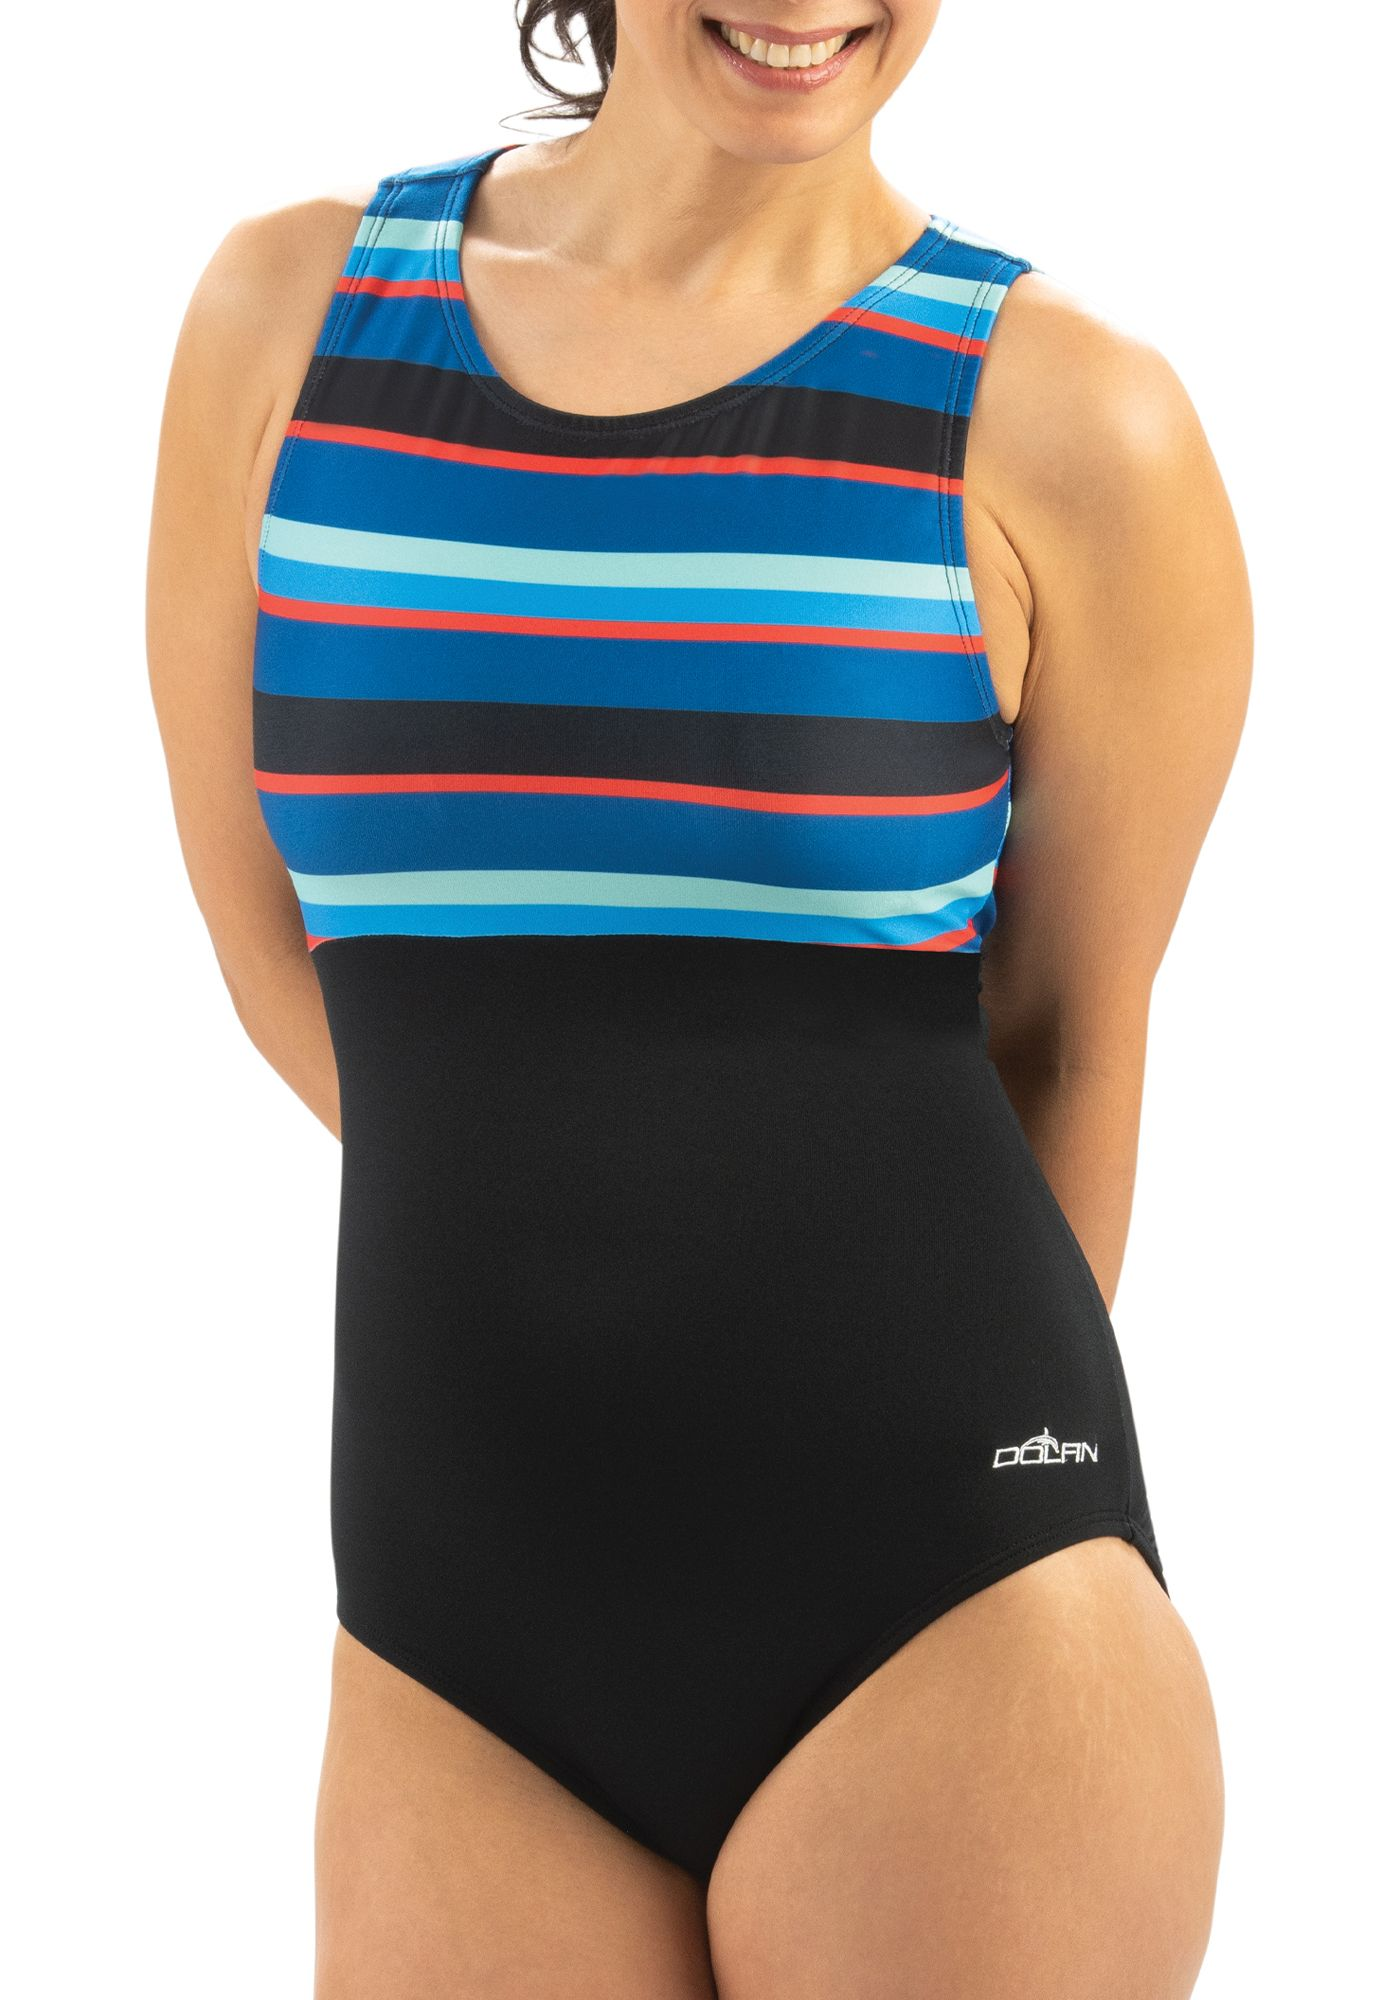 Dolfin Women's Aquashape High Clasp Neck Back One Piece Swimsuit